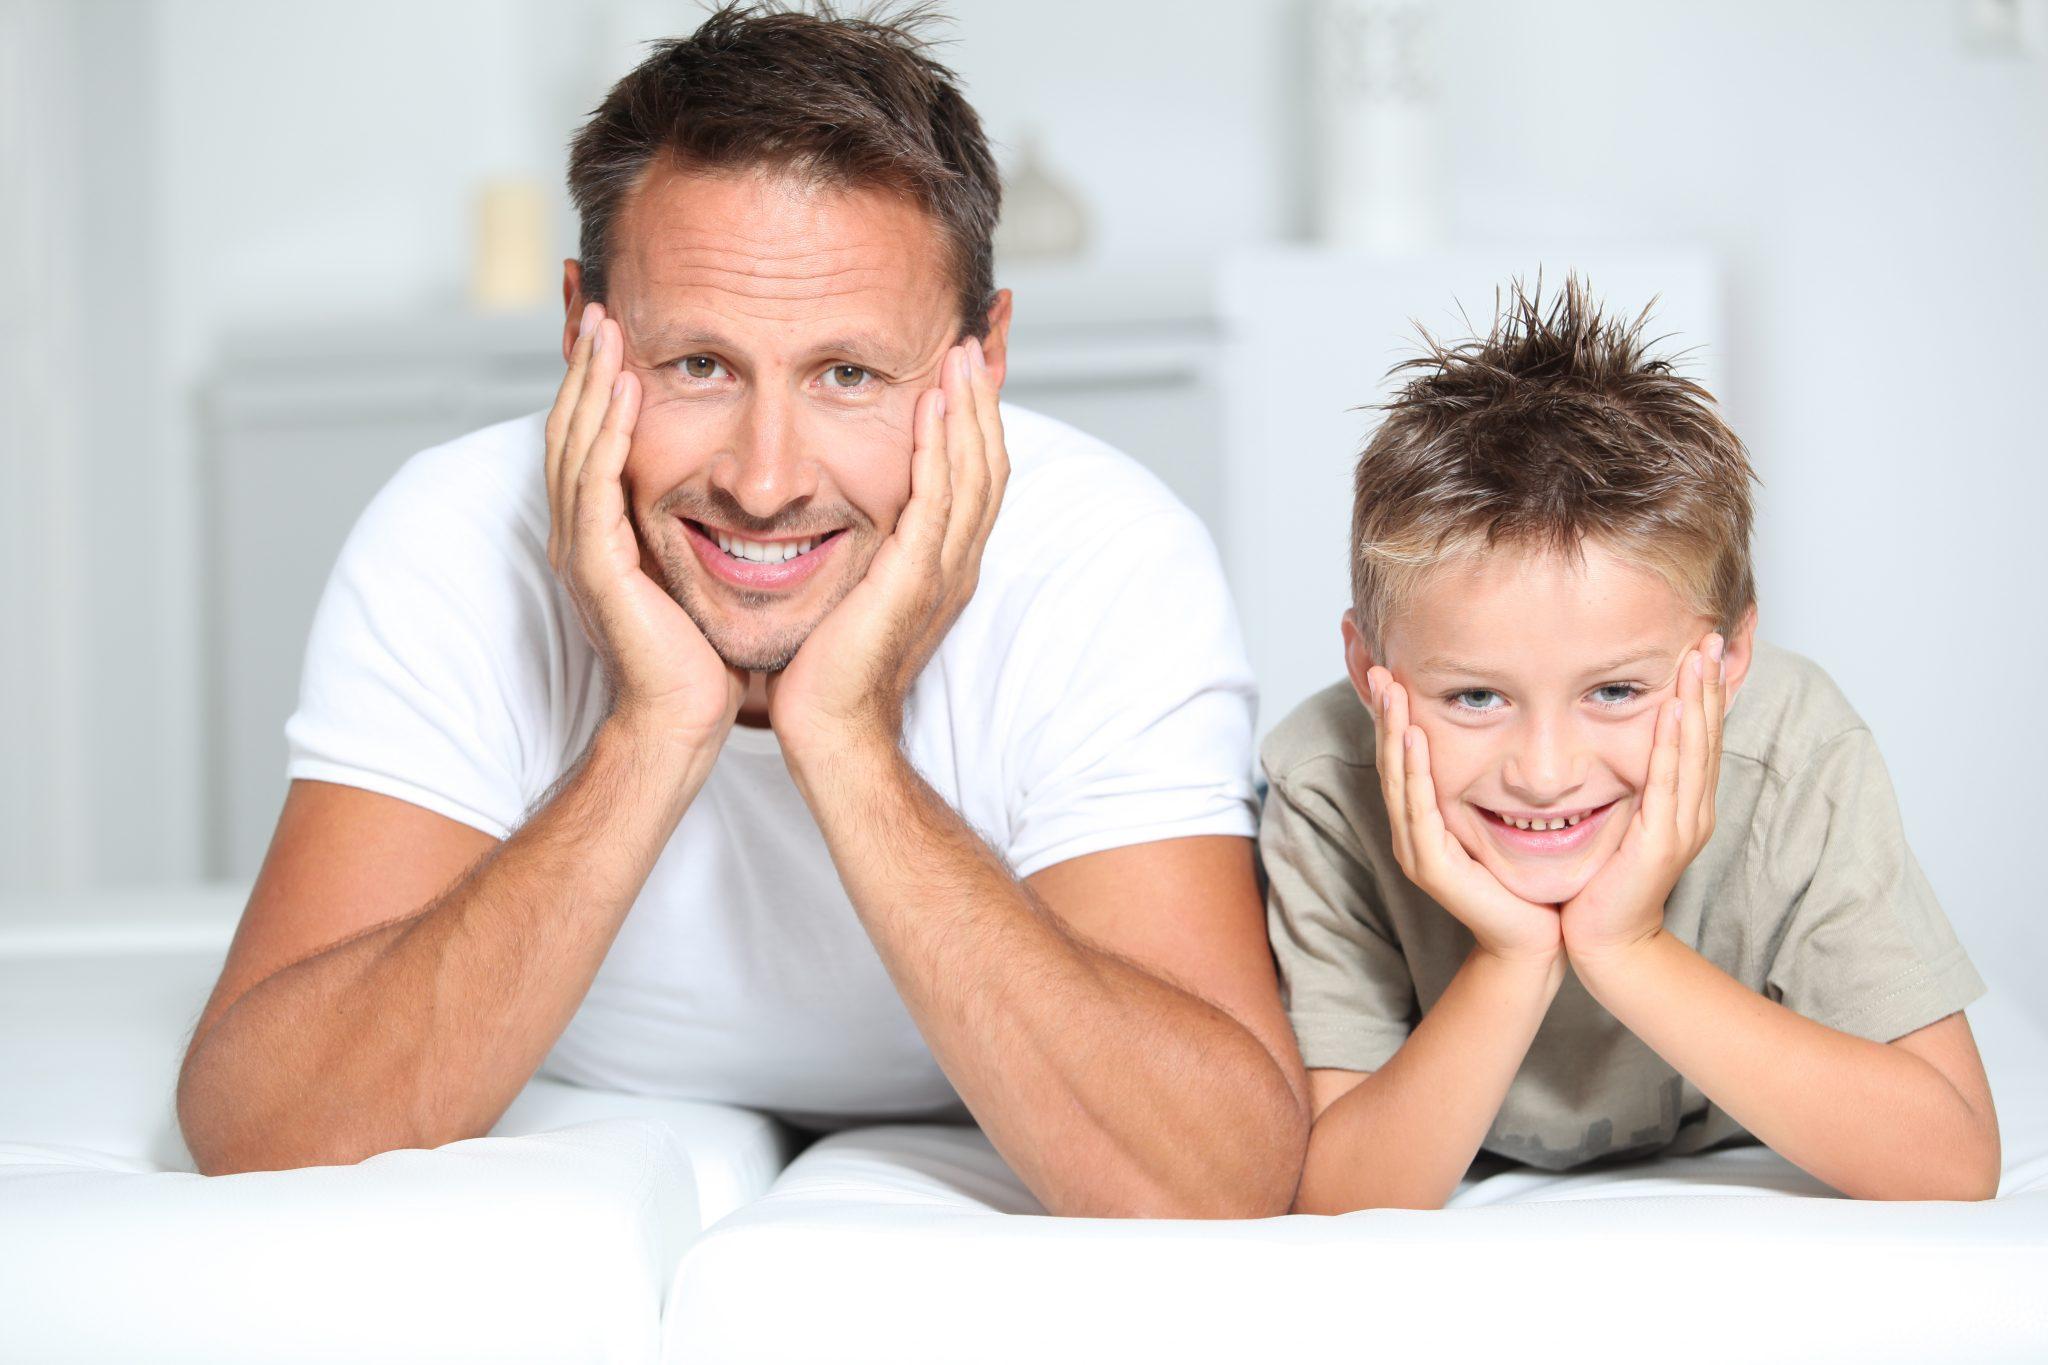 testy na ojcostwo